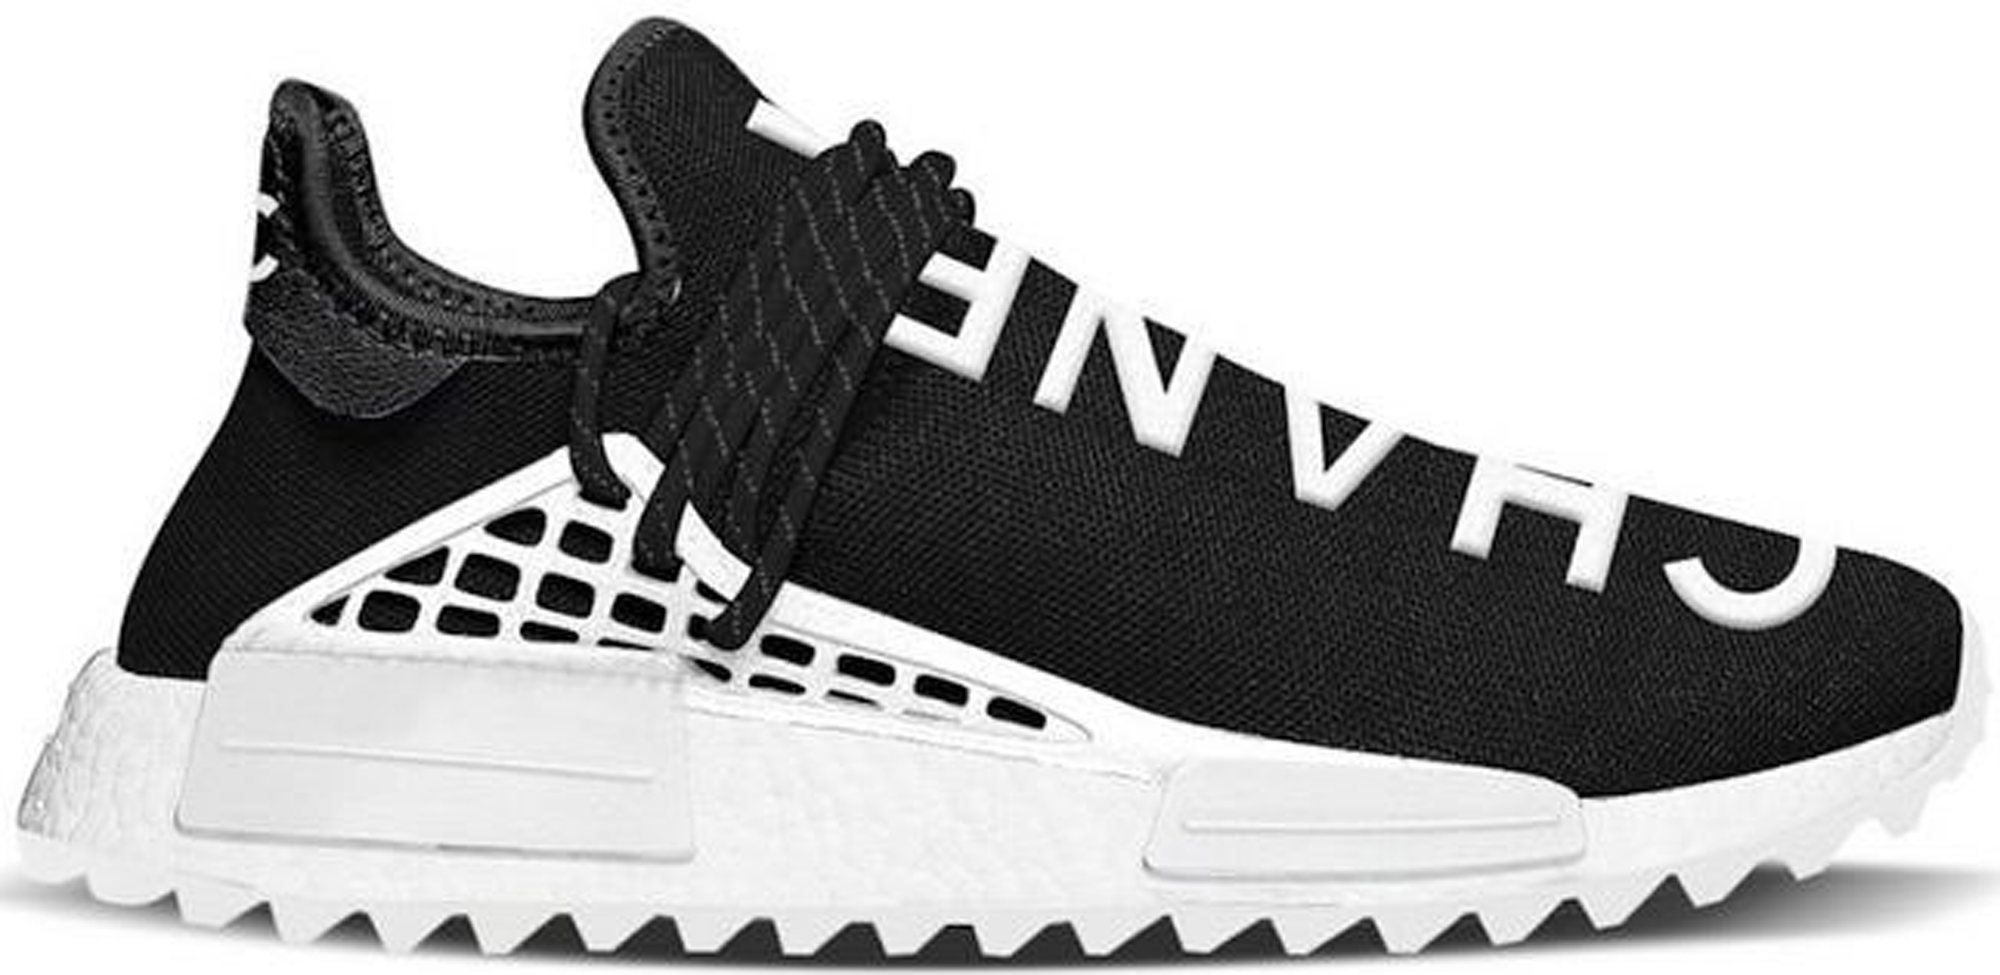 adidas Human Race NMD Black White